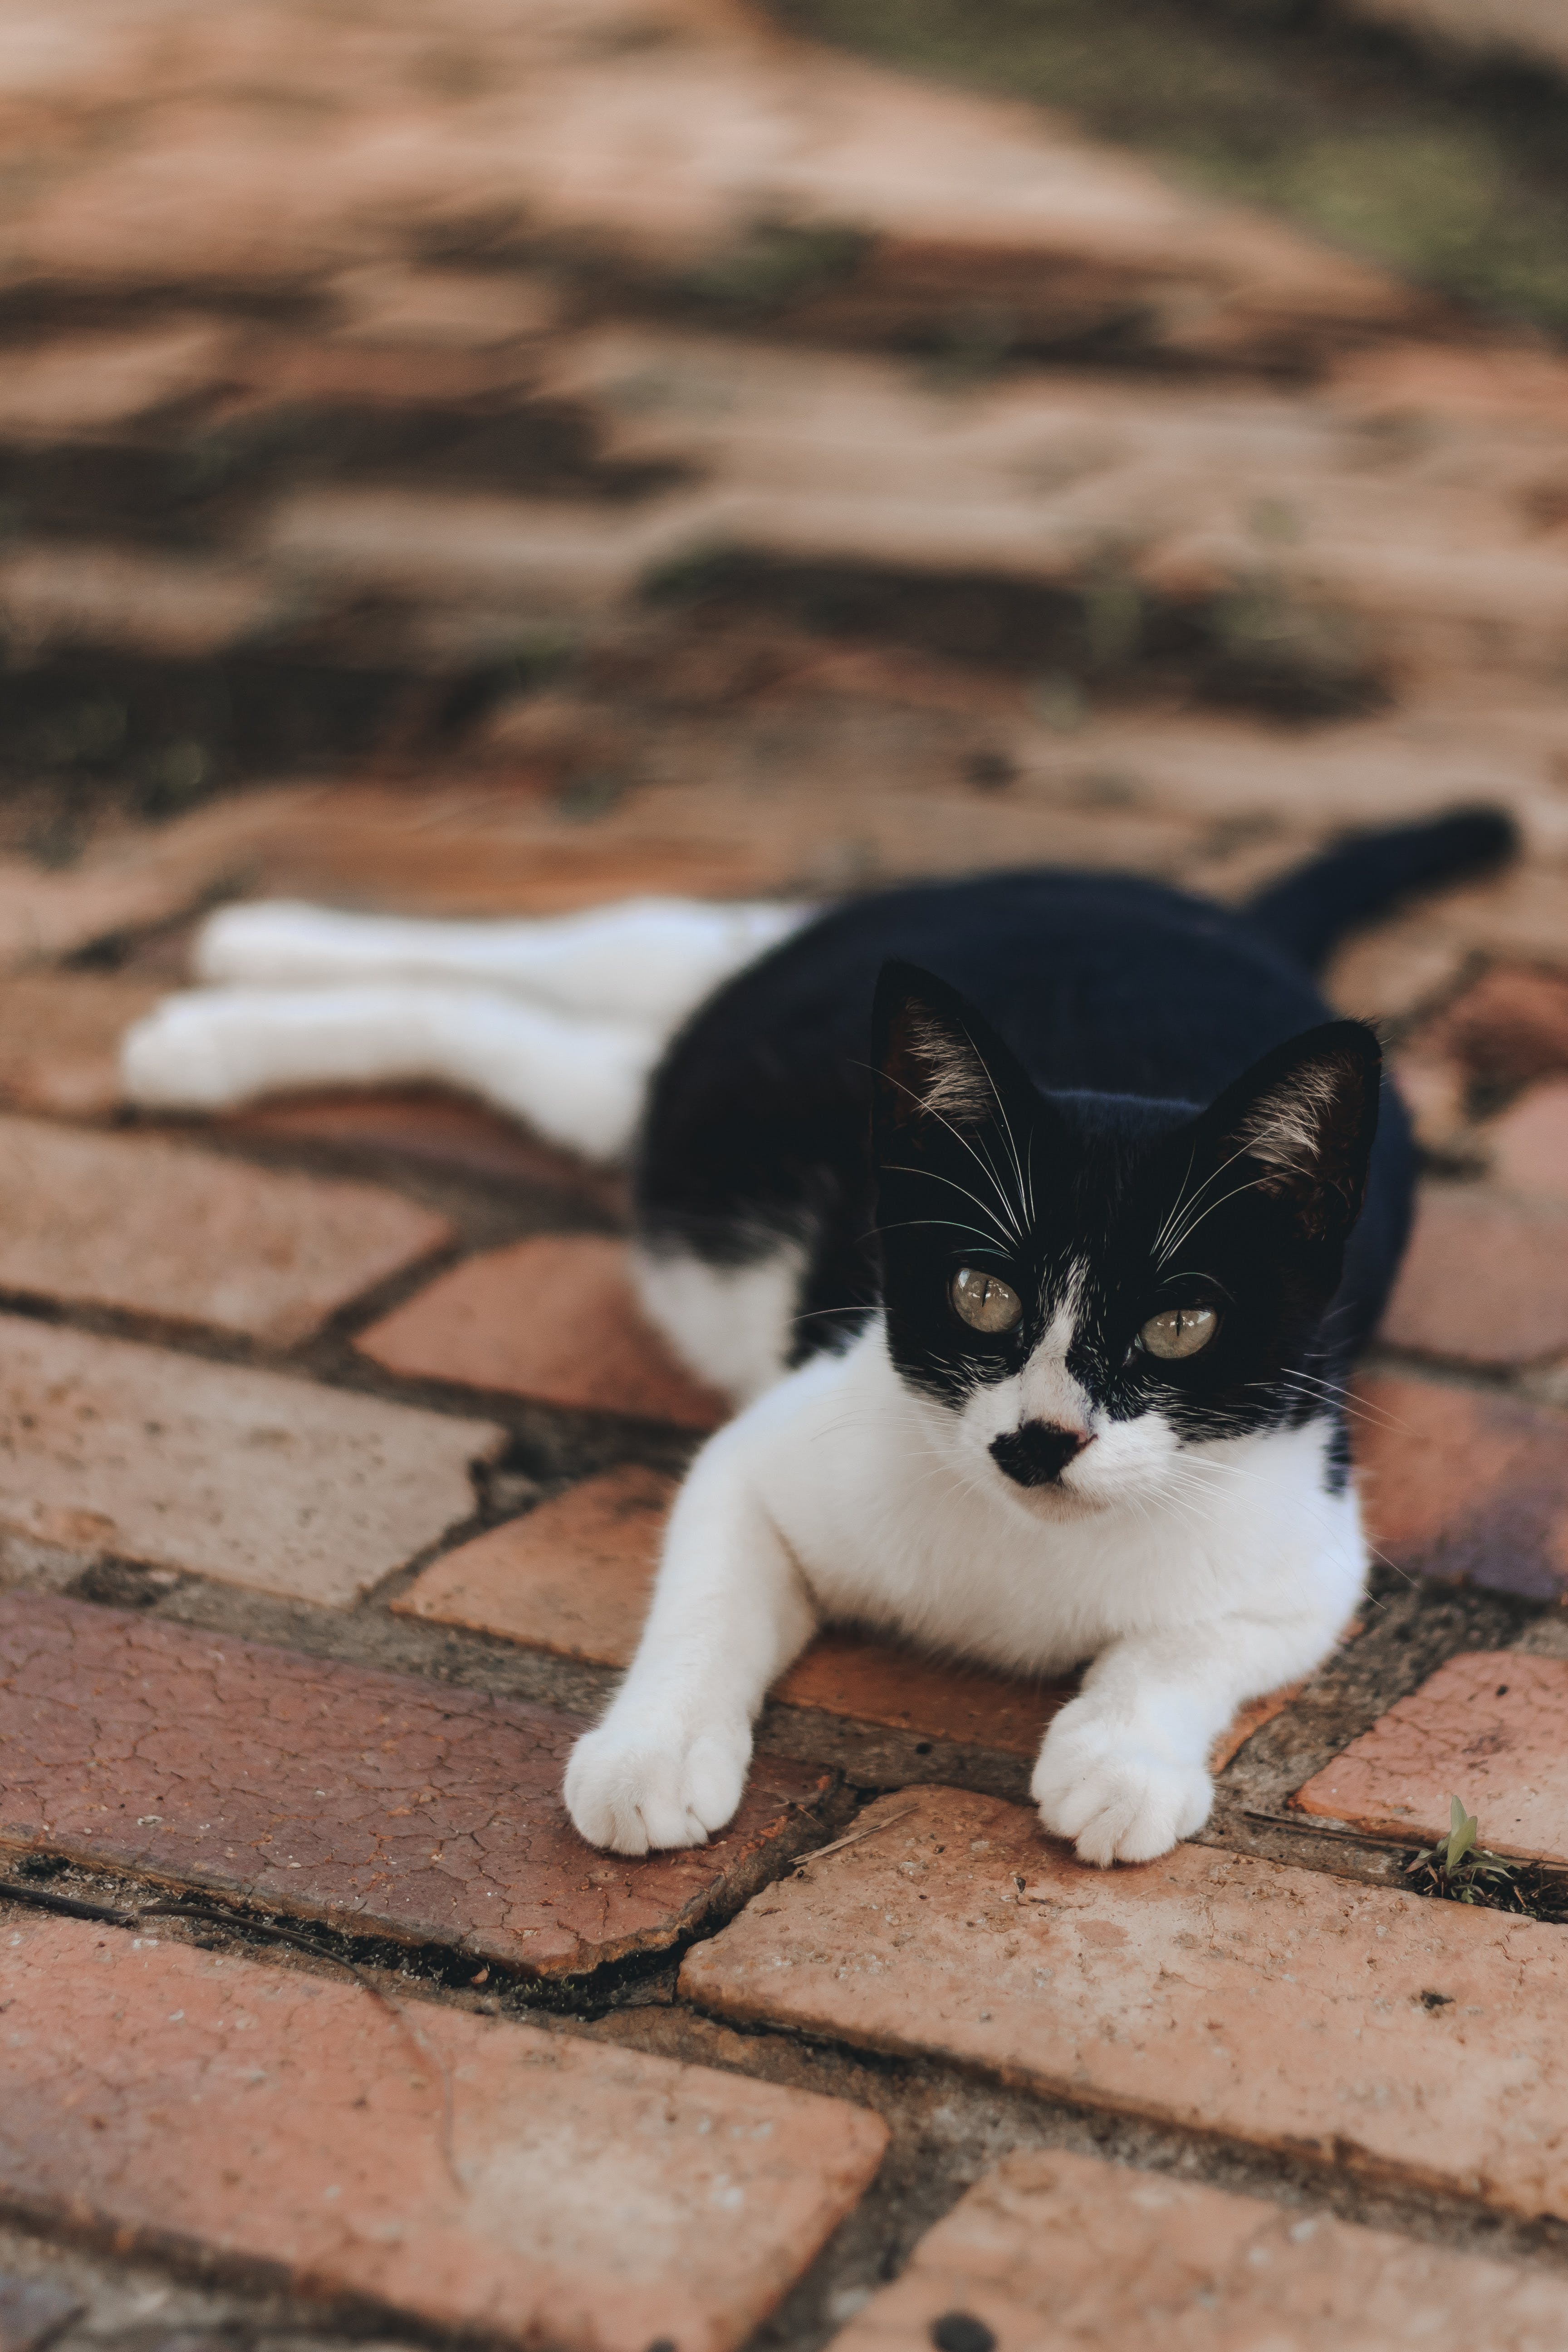 Gratis arkivbilde med bedårende, dyr, katt, kattedyr